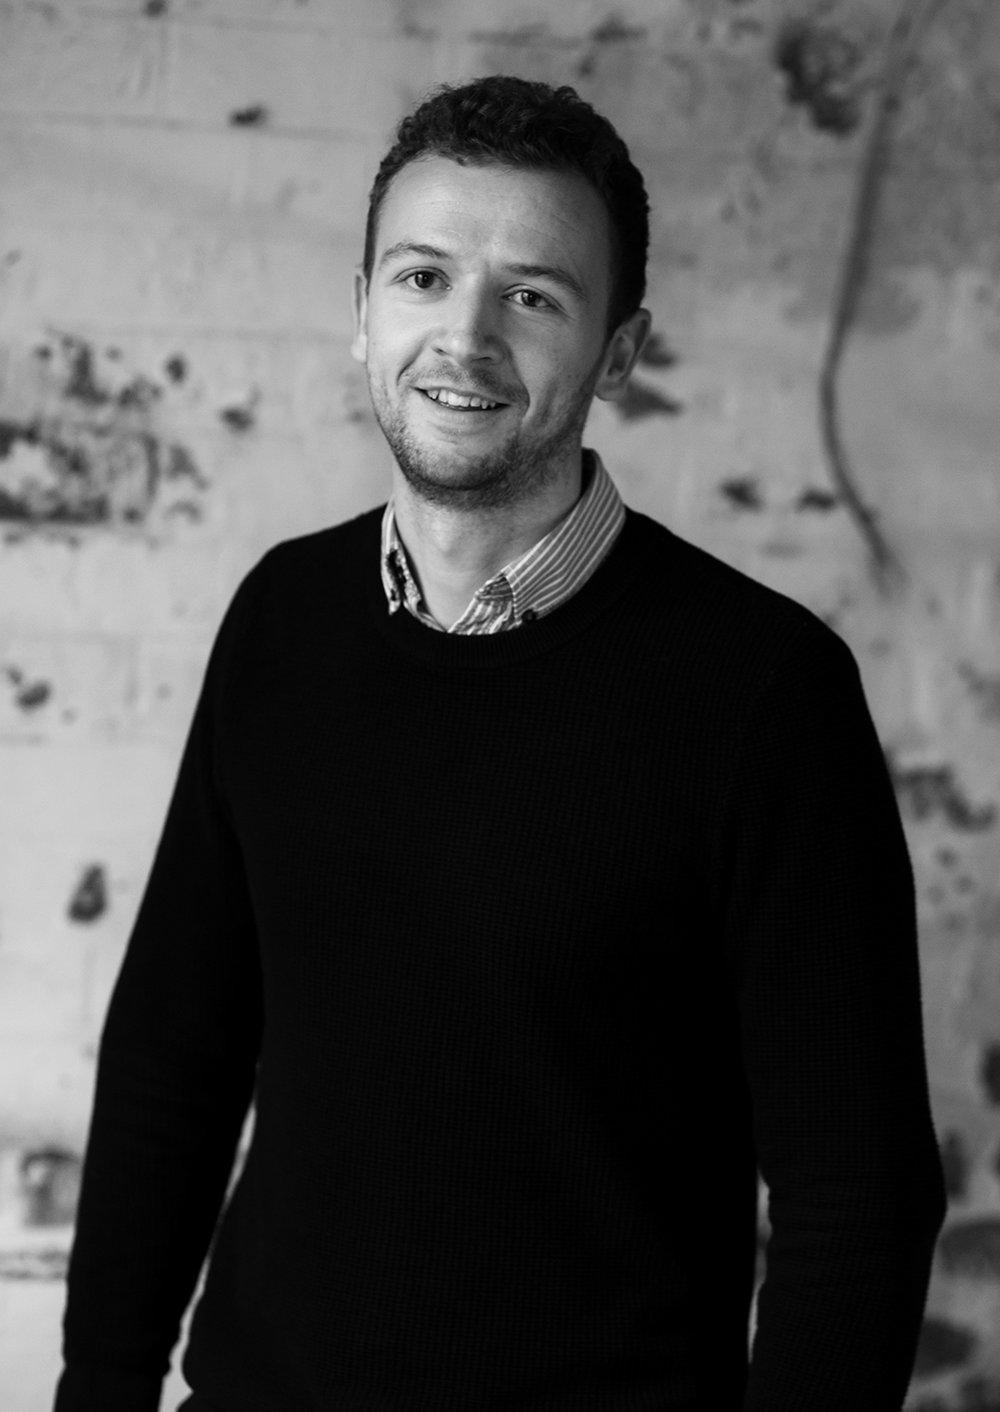 Liam Marsden - Pt II Architectural Assistant